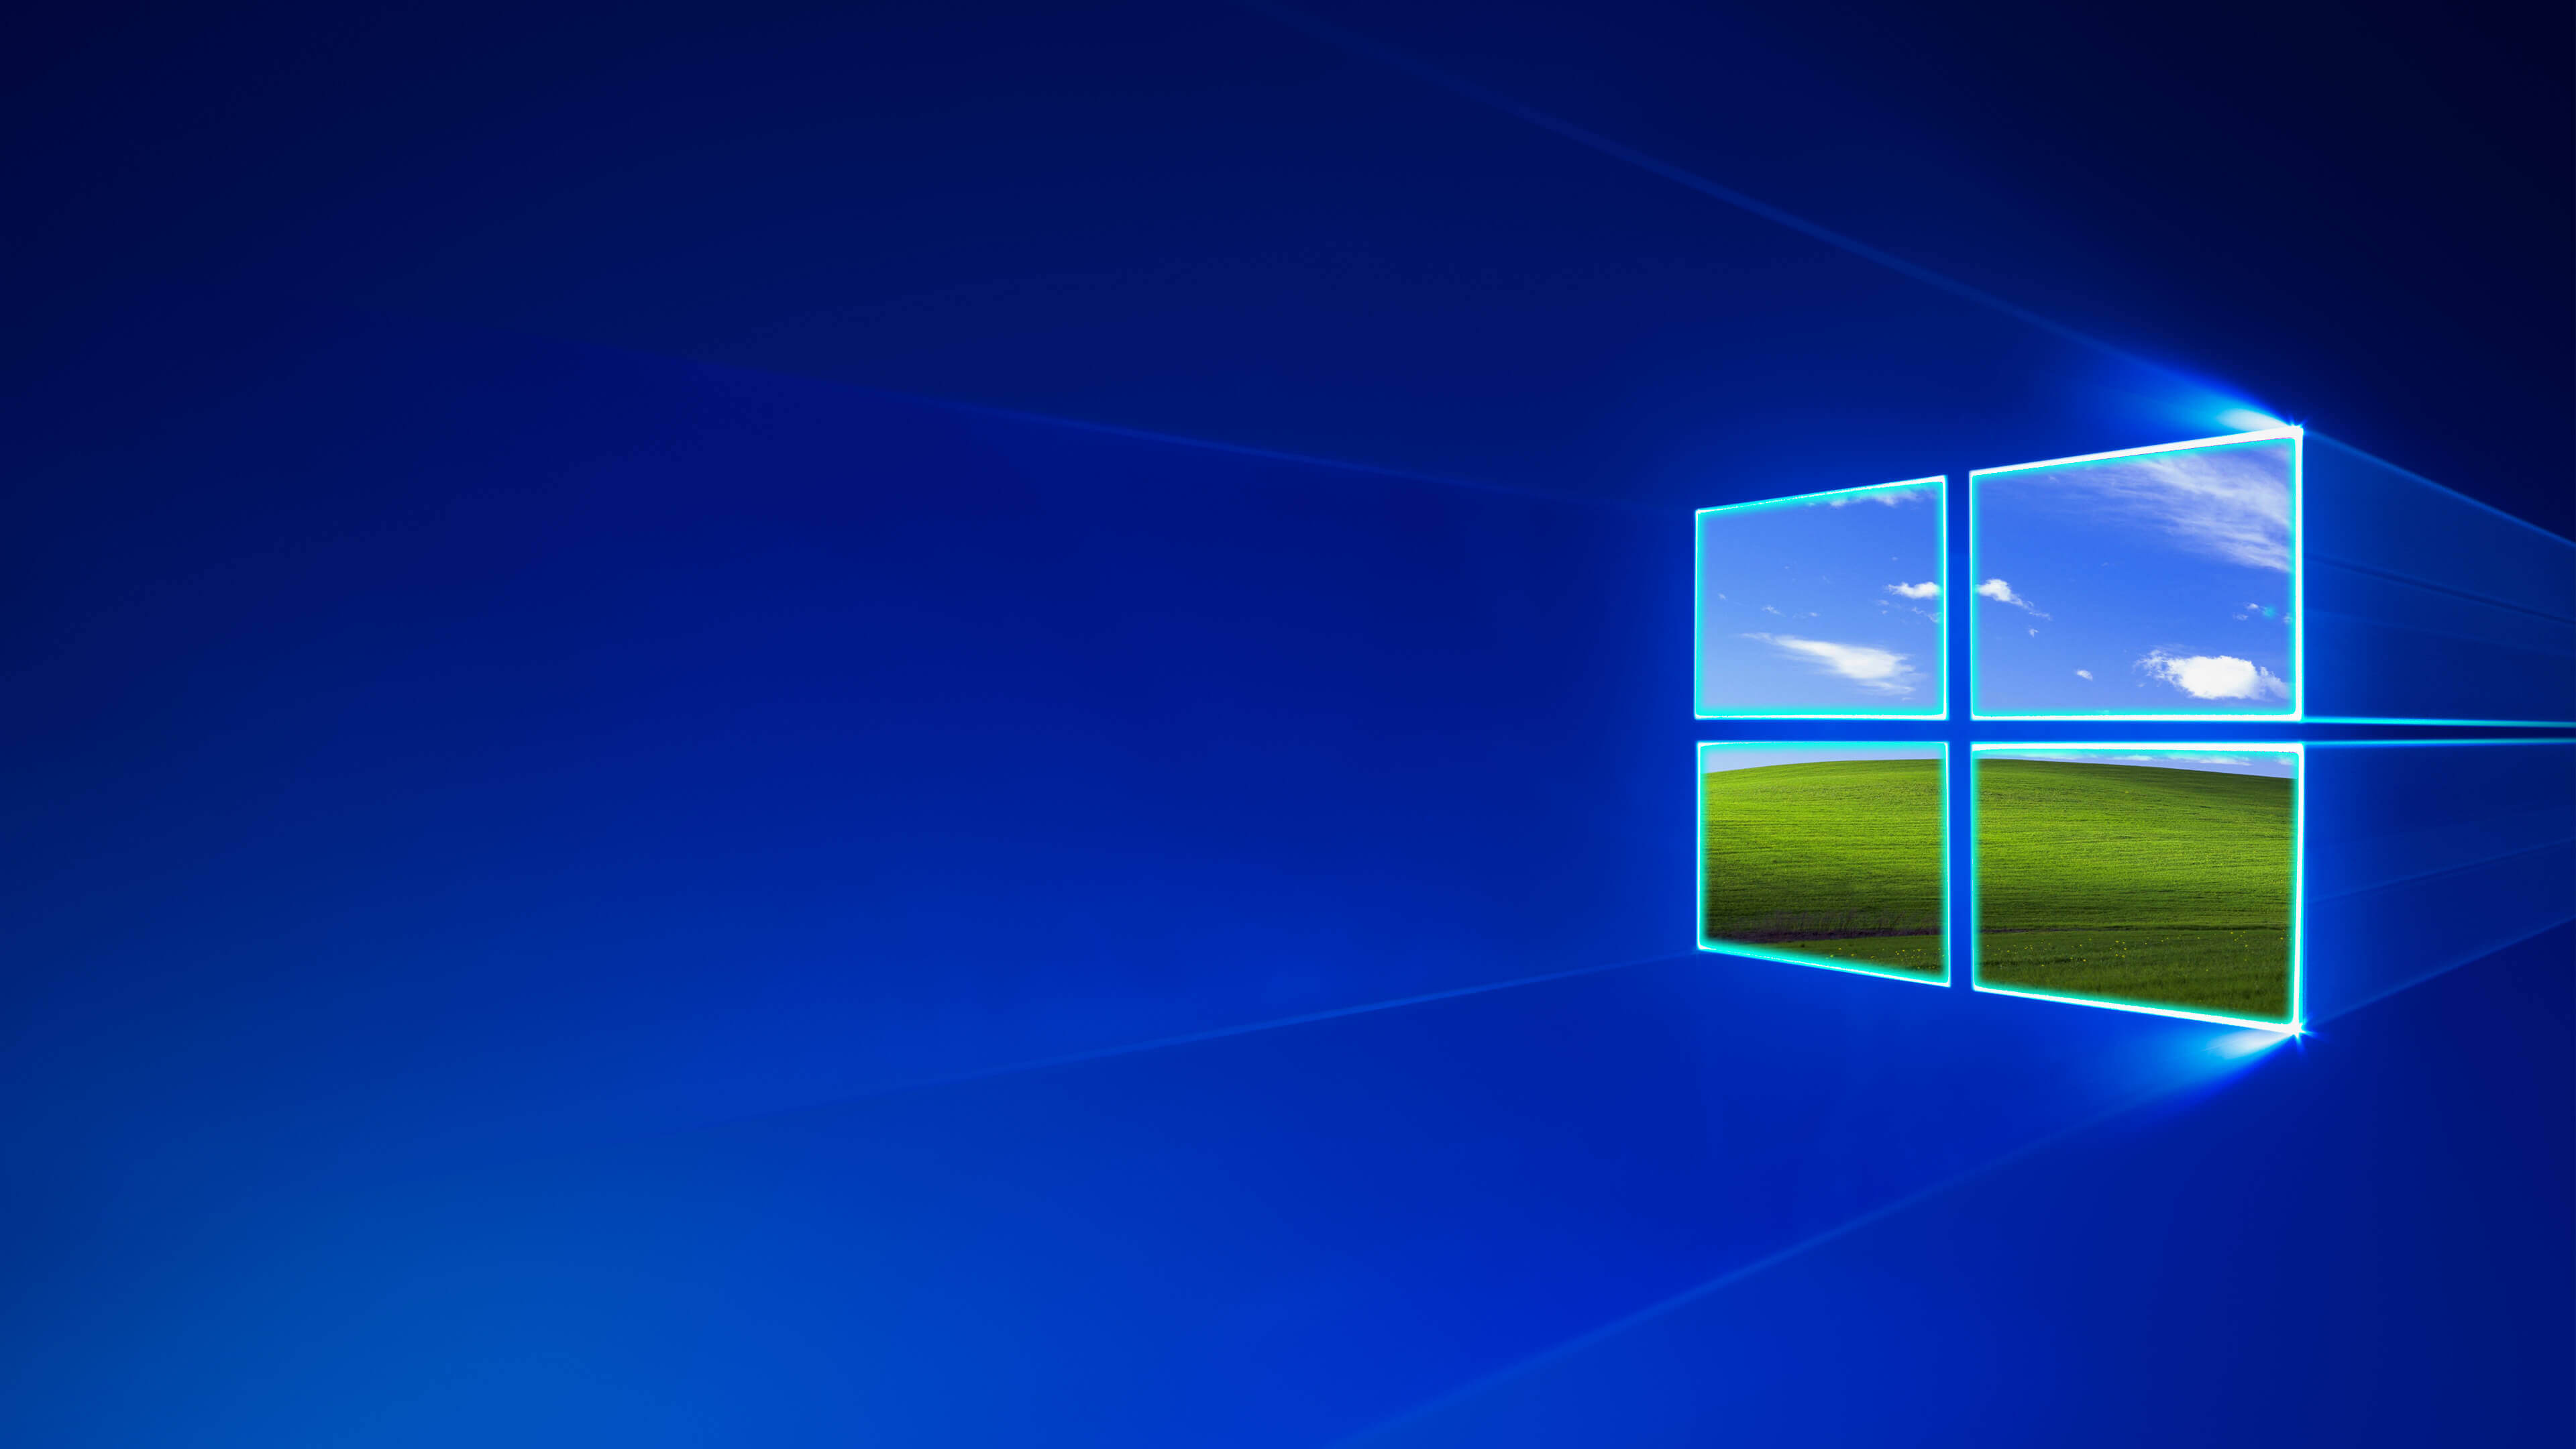 Windows 10 Bliss By Michael Gillett Wallpapers Wallpaperhub